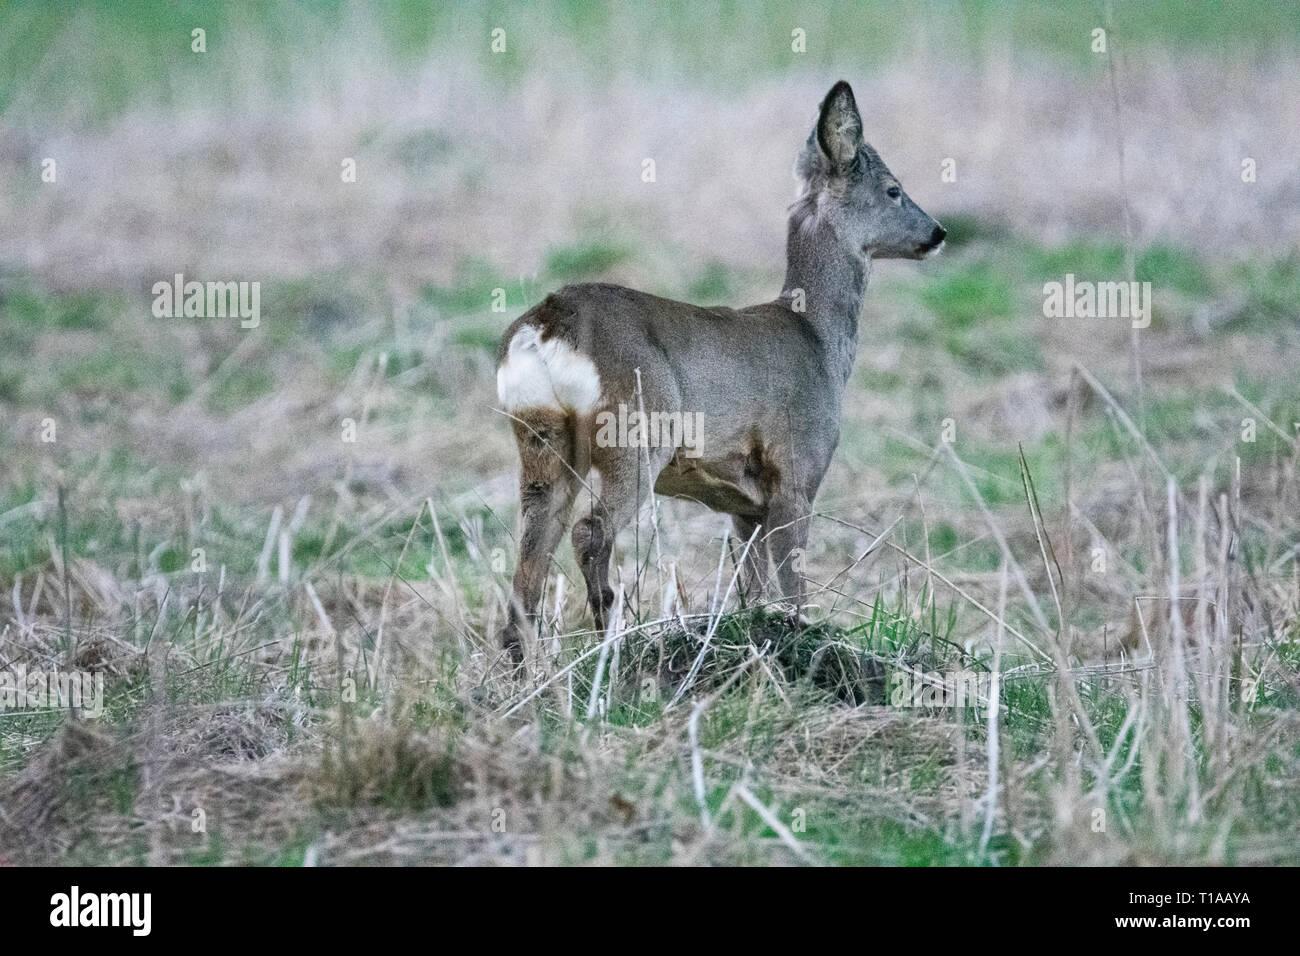 Little deer watching for enemies - Stock Image